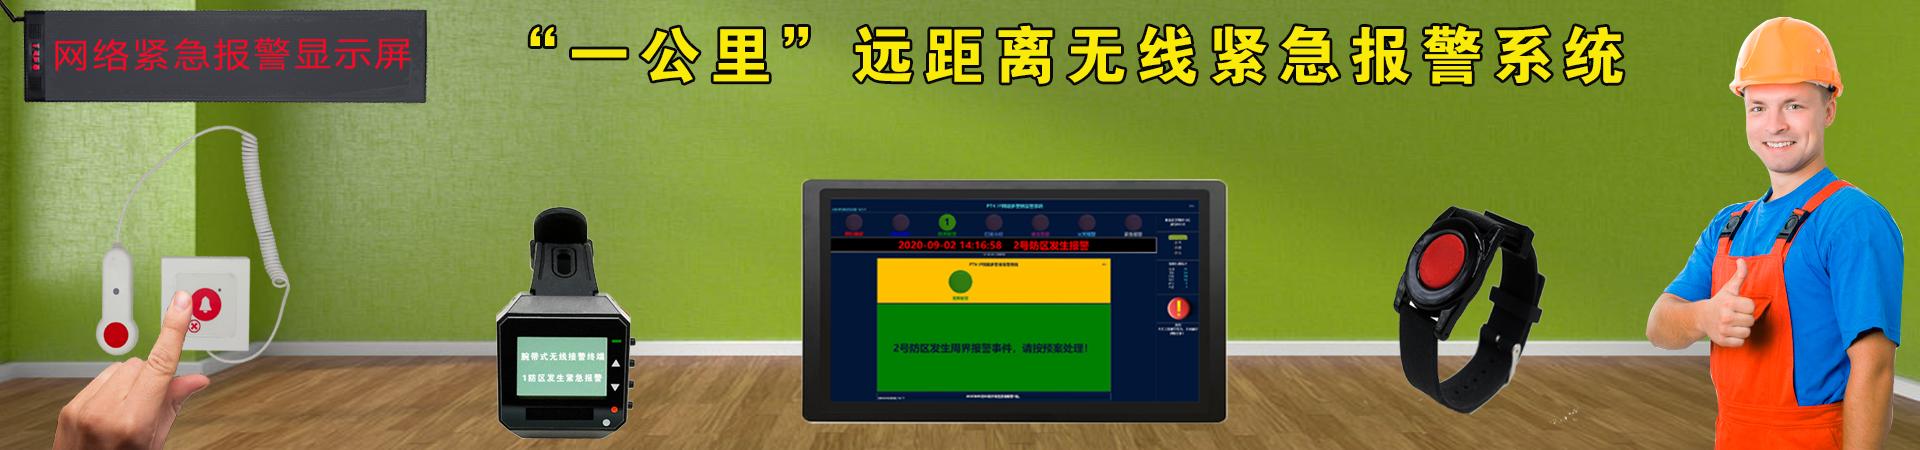 IP网络报警LCD显示屏